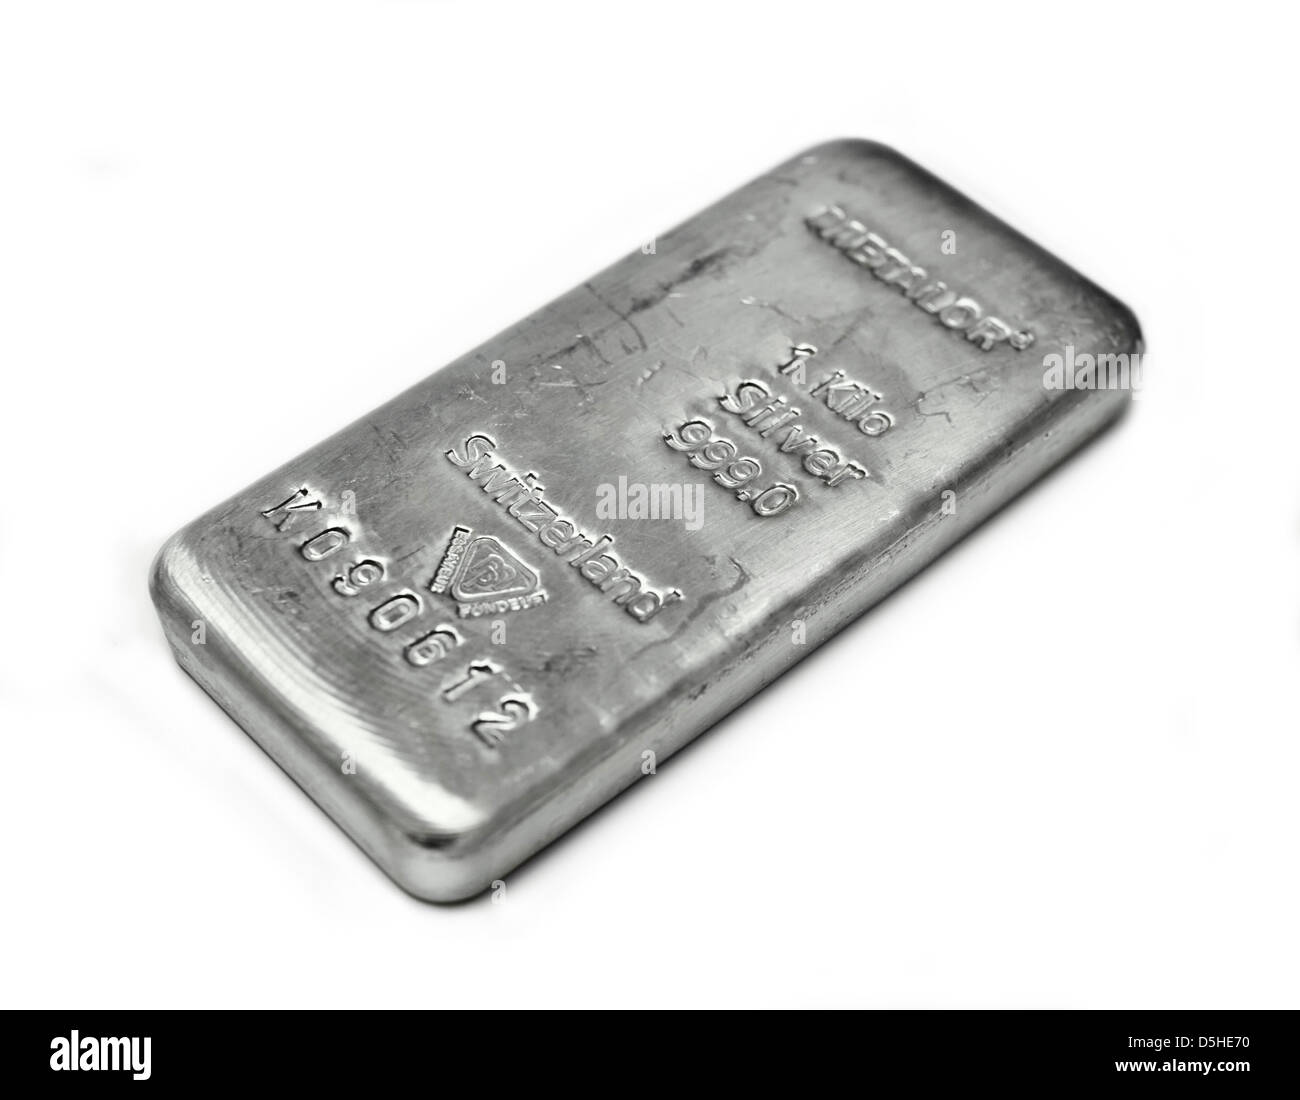 Silver bullion bar weighing one kilogram on plain white background - Stock Image